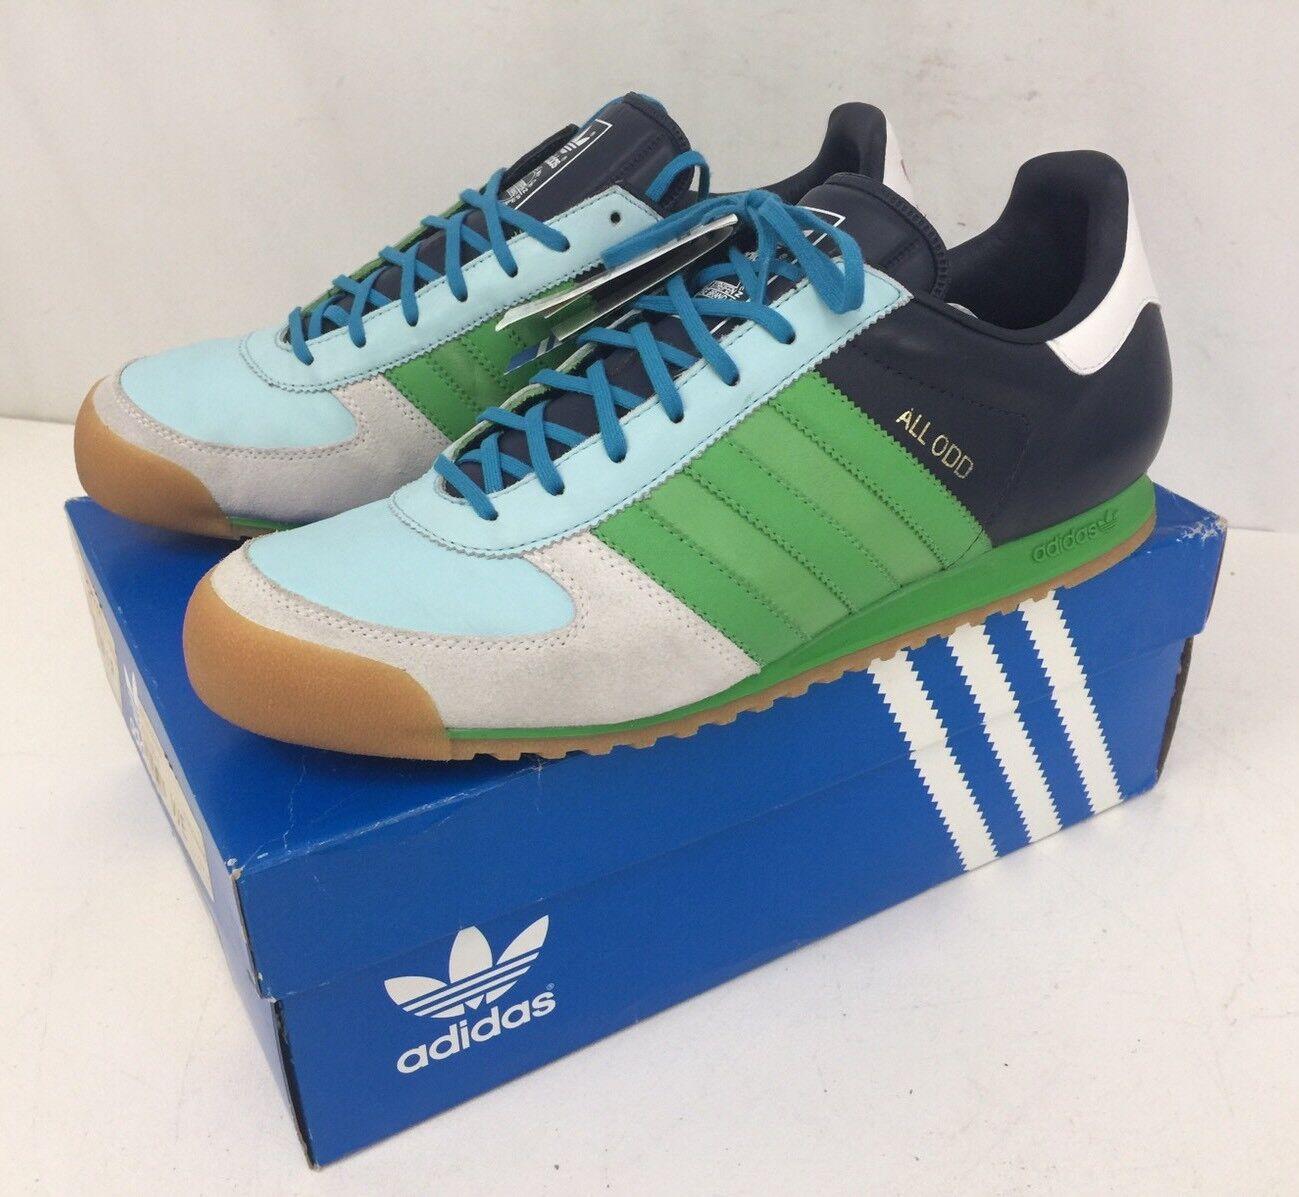 Vtg 807014 Rare Adidas All Black 807014 Vtg All Odd Mens 13 Mint In Box Original Shoes 51107d